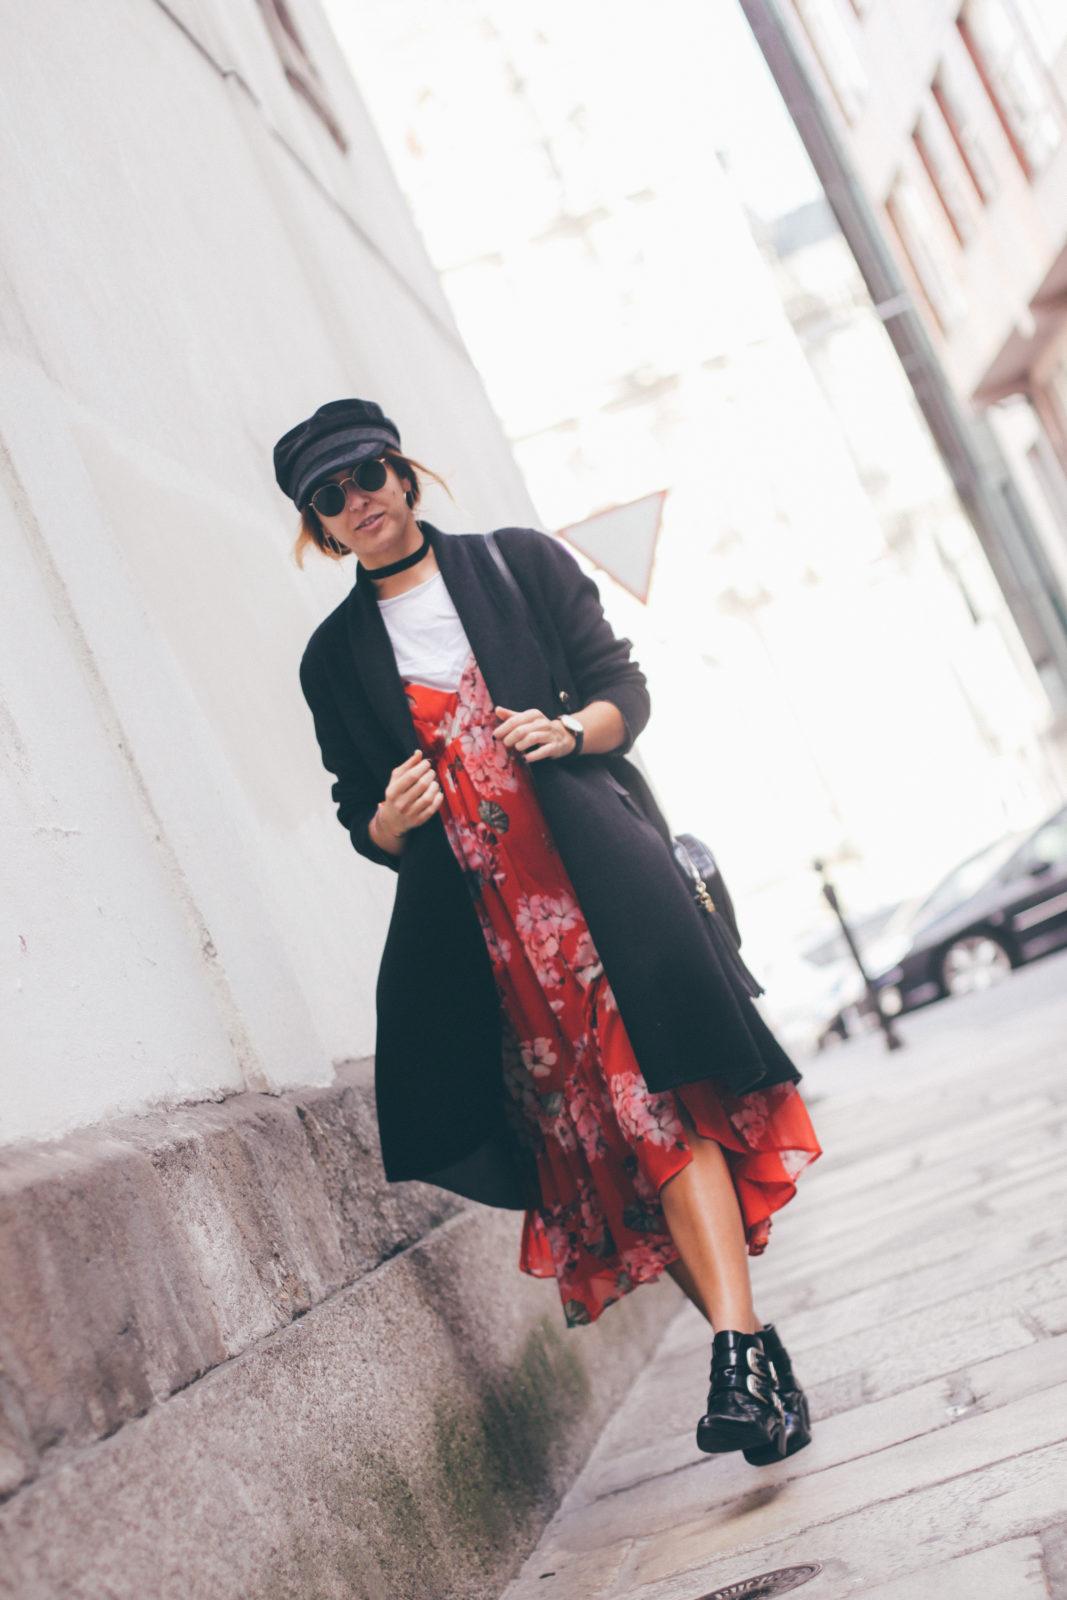 baker_boy_hat_vestido_con_camiseta_gorra_marinera_botines_hebillas_fall_2016_trends_street_style_outfits_donkeycool-2